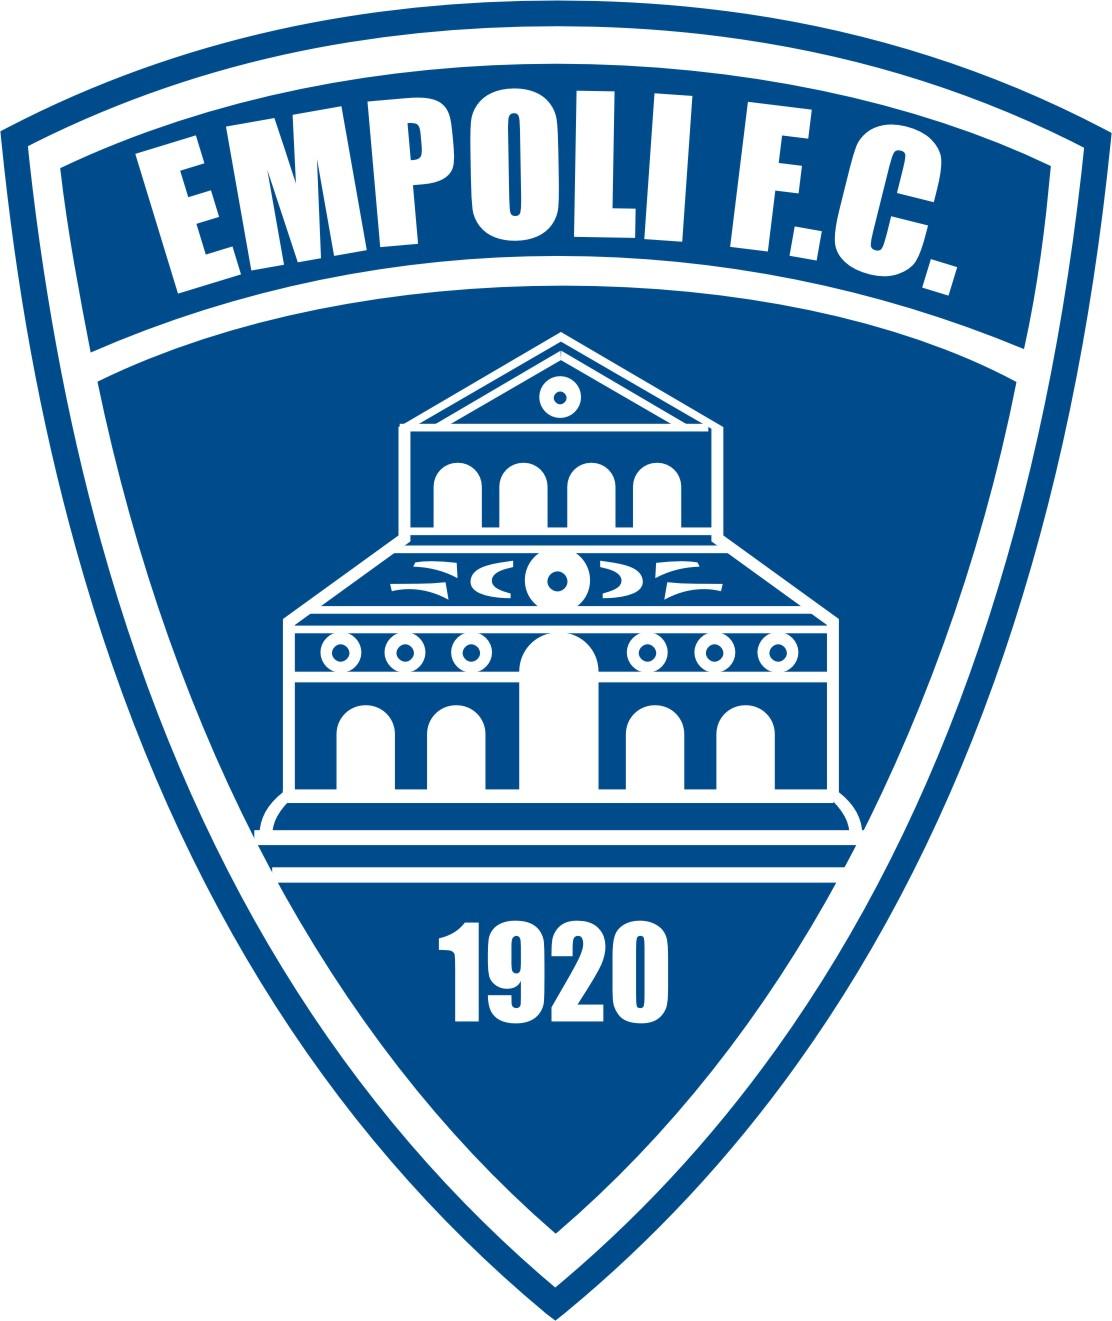 Empoli F.c.   Italia - New Empoli Fc, Transparent background PNG HD thumbnail